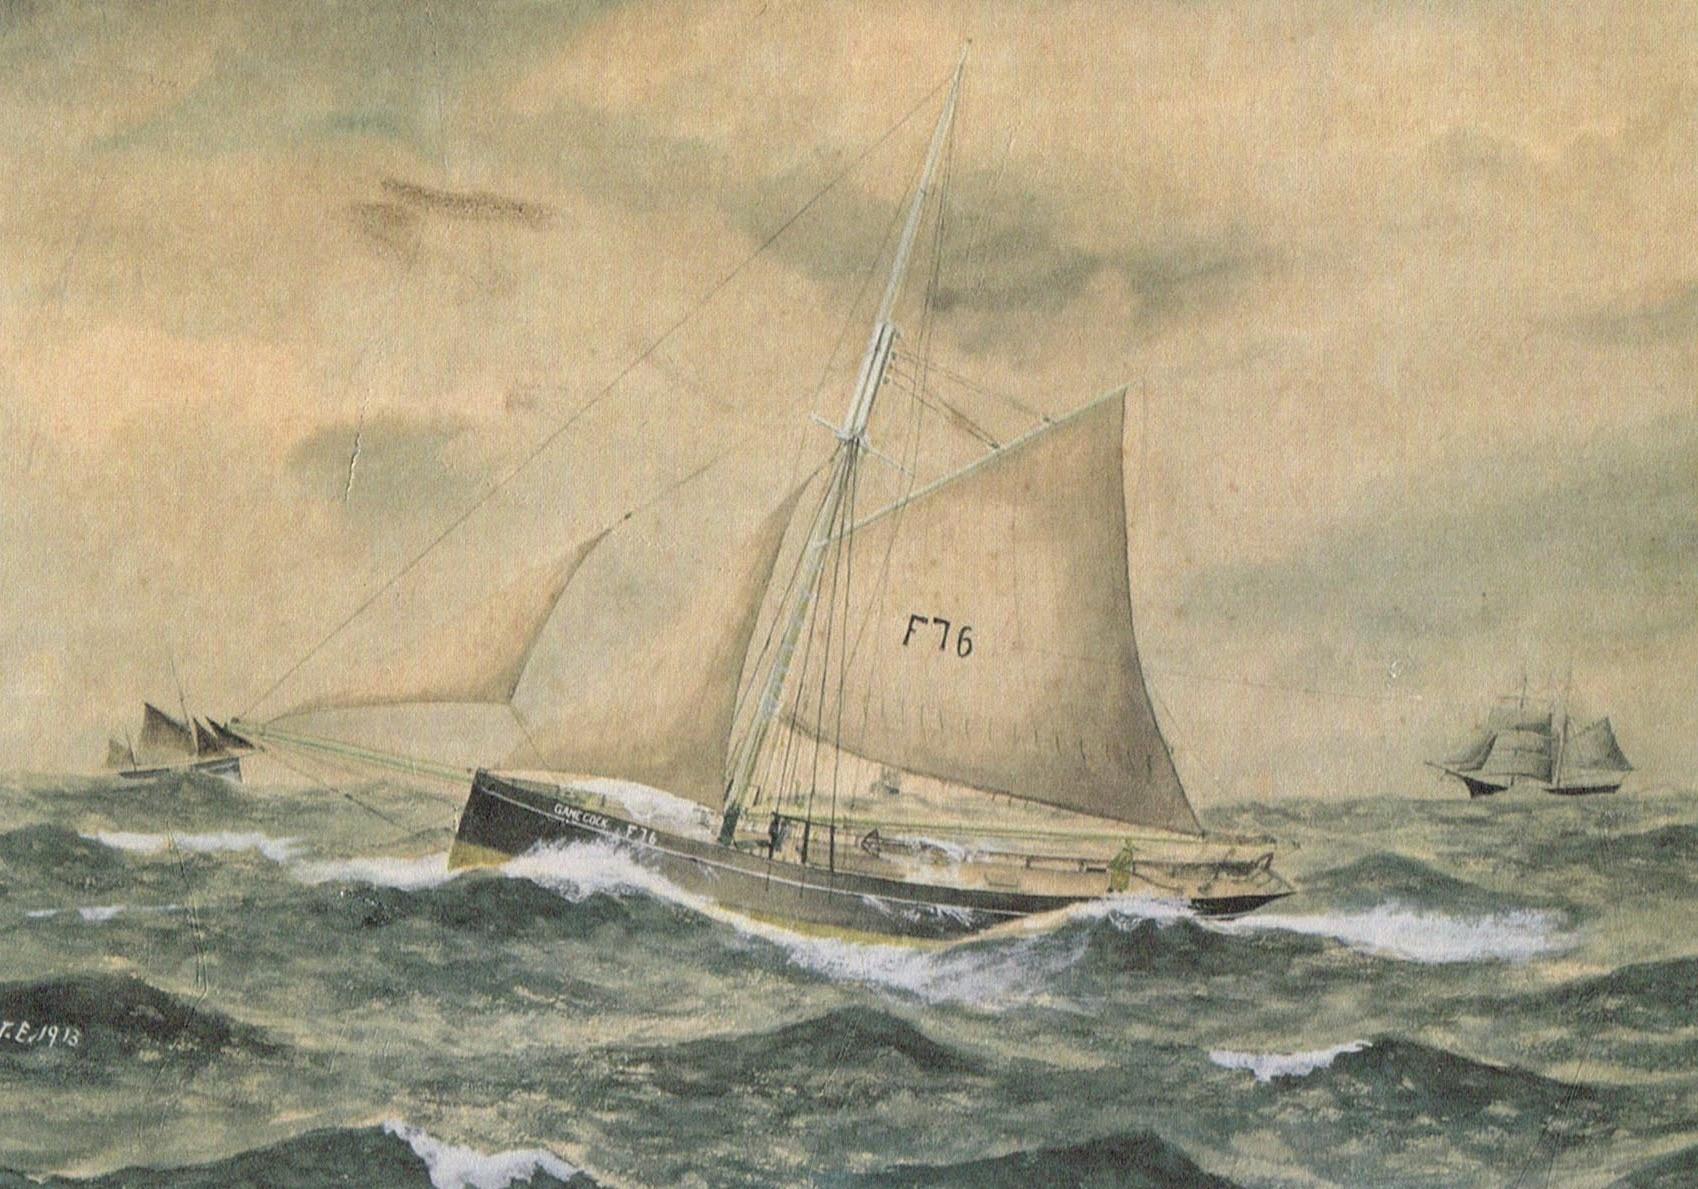 Barge Racing